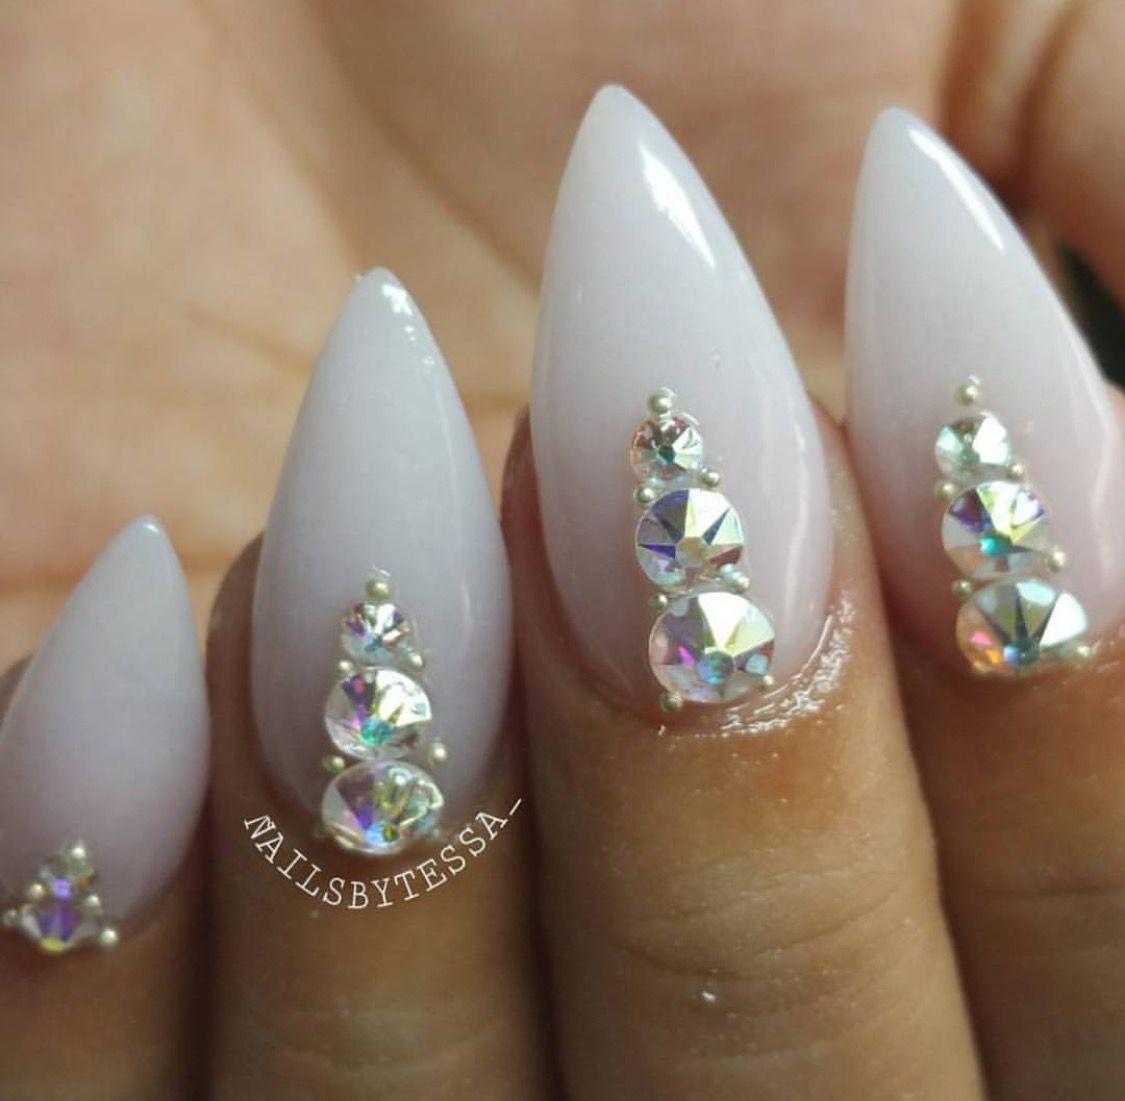 Pin by Schnee Orosco on Nails | Pinterest | Bling nail art, Bling ...